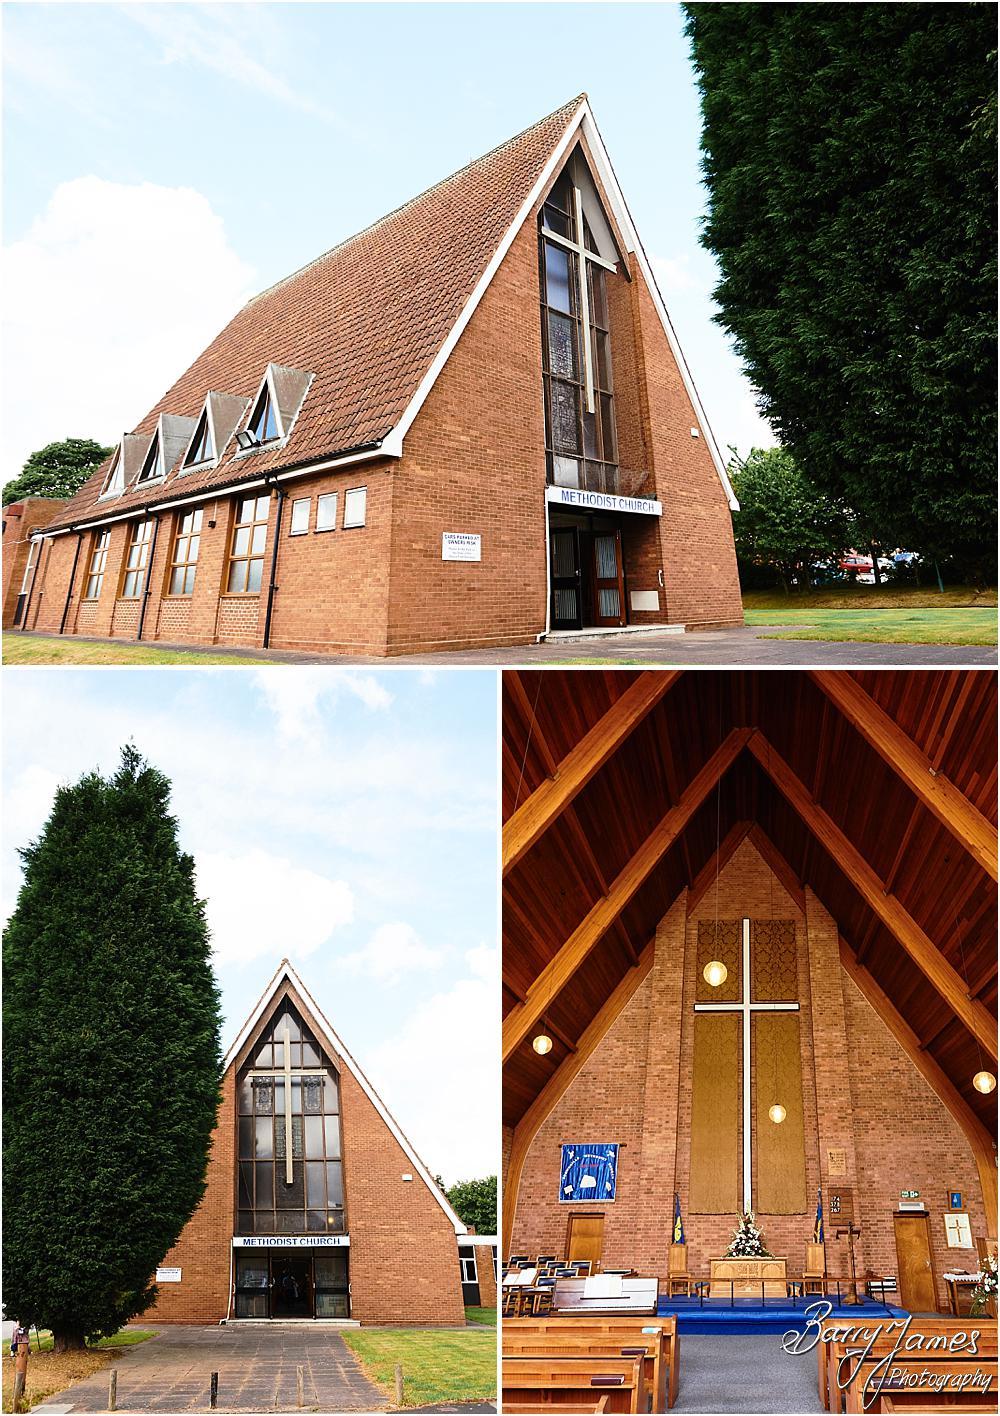 Wedding photographs at Brownhills Methodist Church in Walsall by Walsall Wedding Photographer Barry James